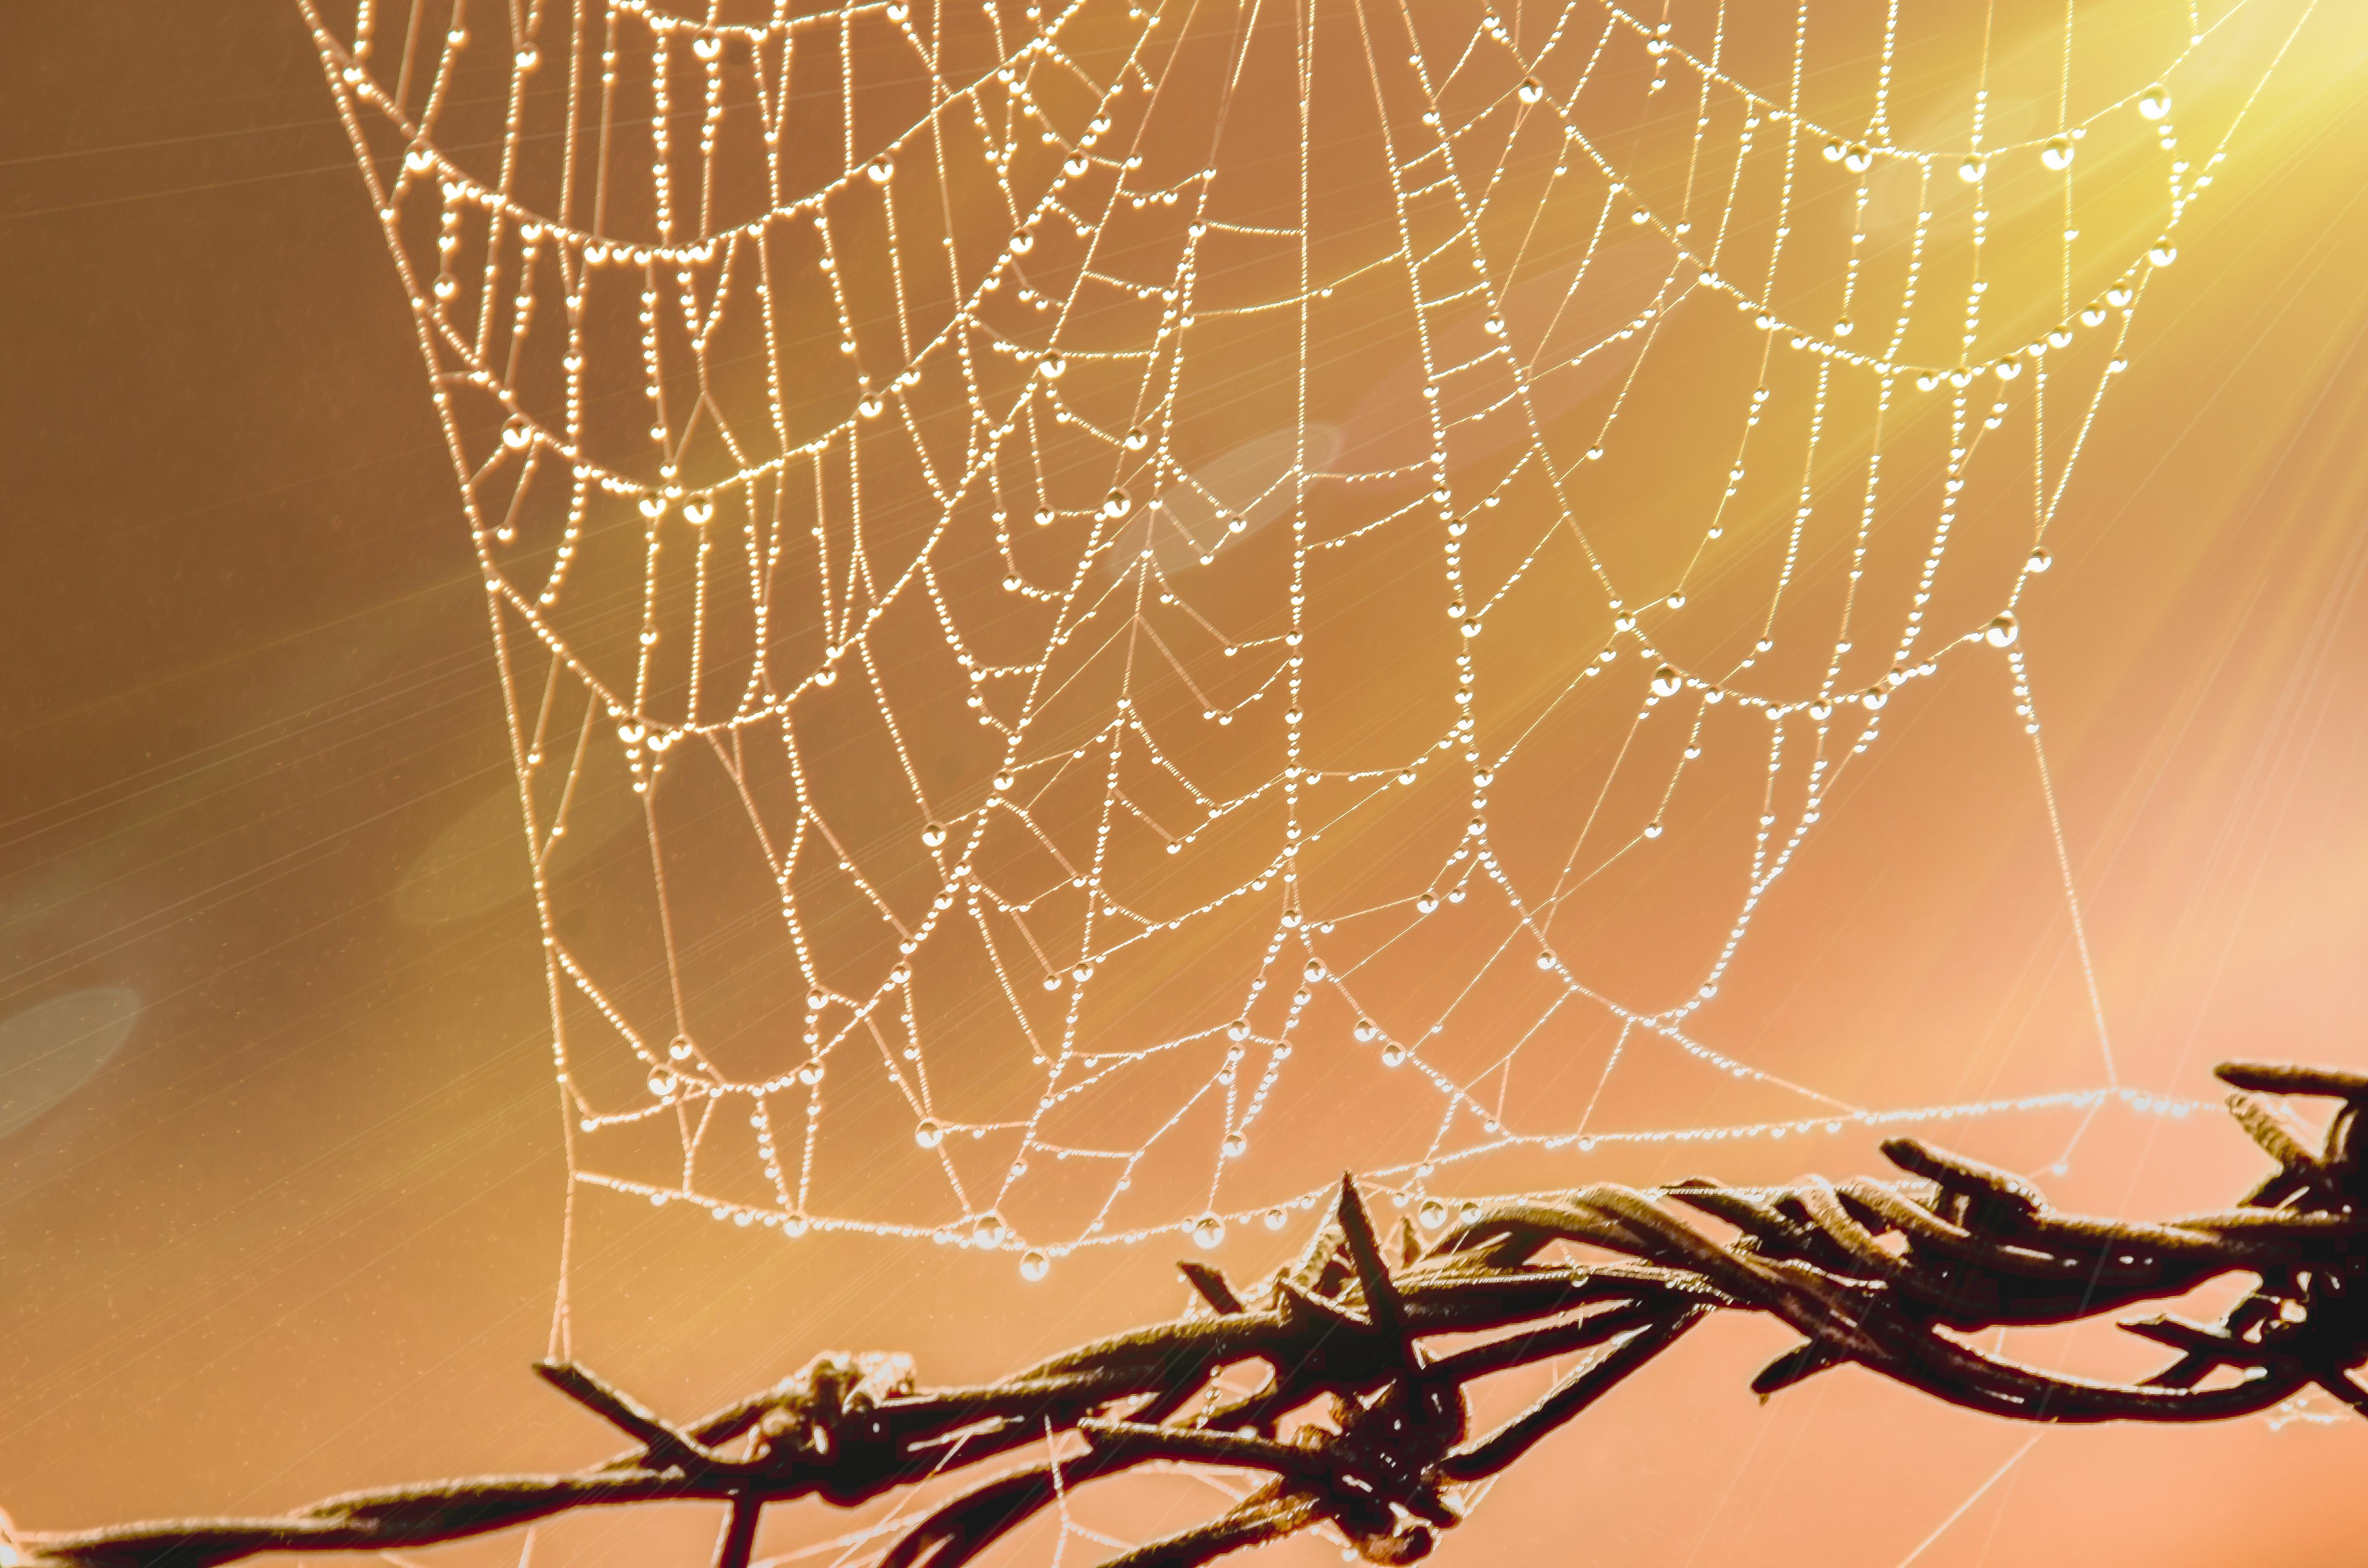 Free Images : spider web, light, branch